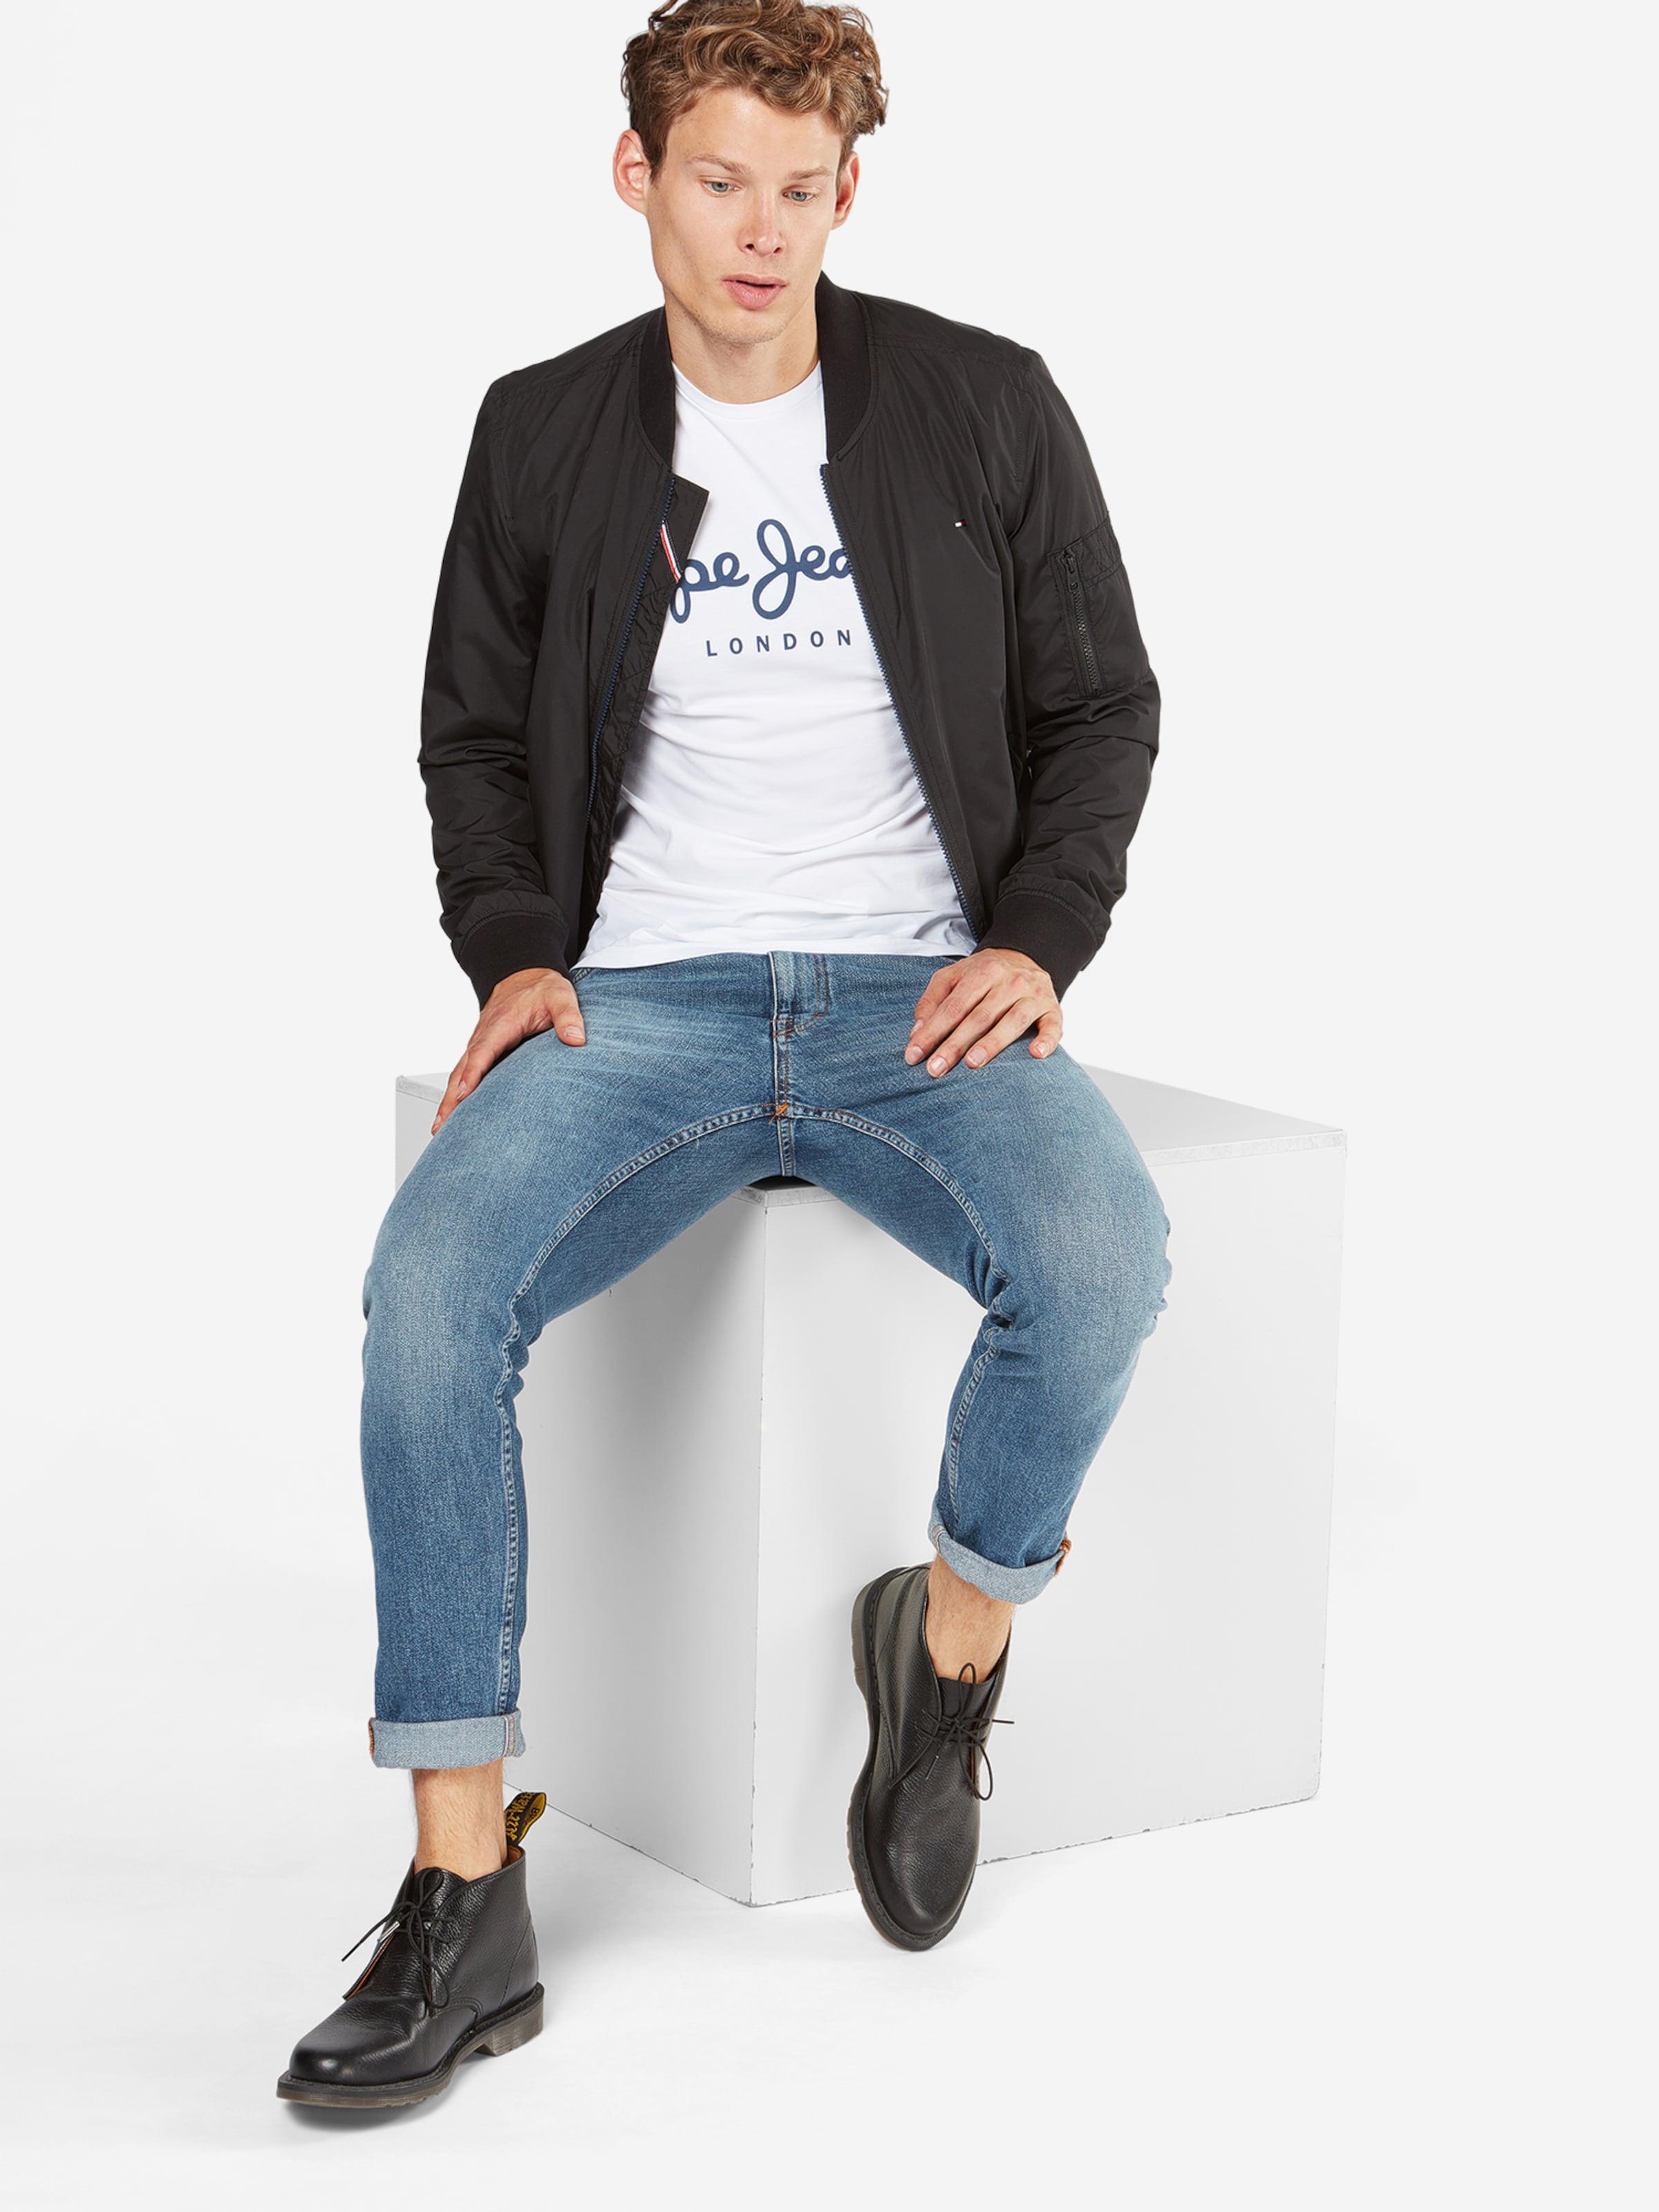 Pepe Jeans Shirt 'ORIGINAL STRETCH' Große Überraschung Günstiger Preis tBMwif5T